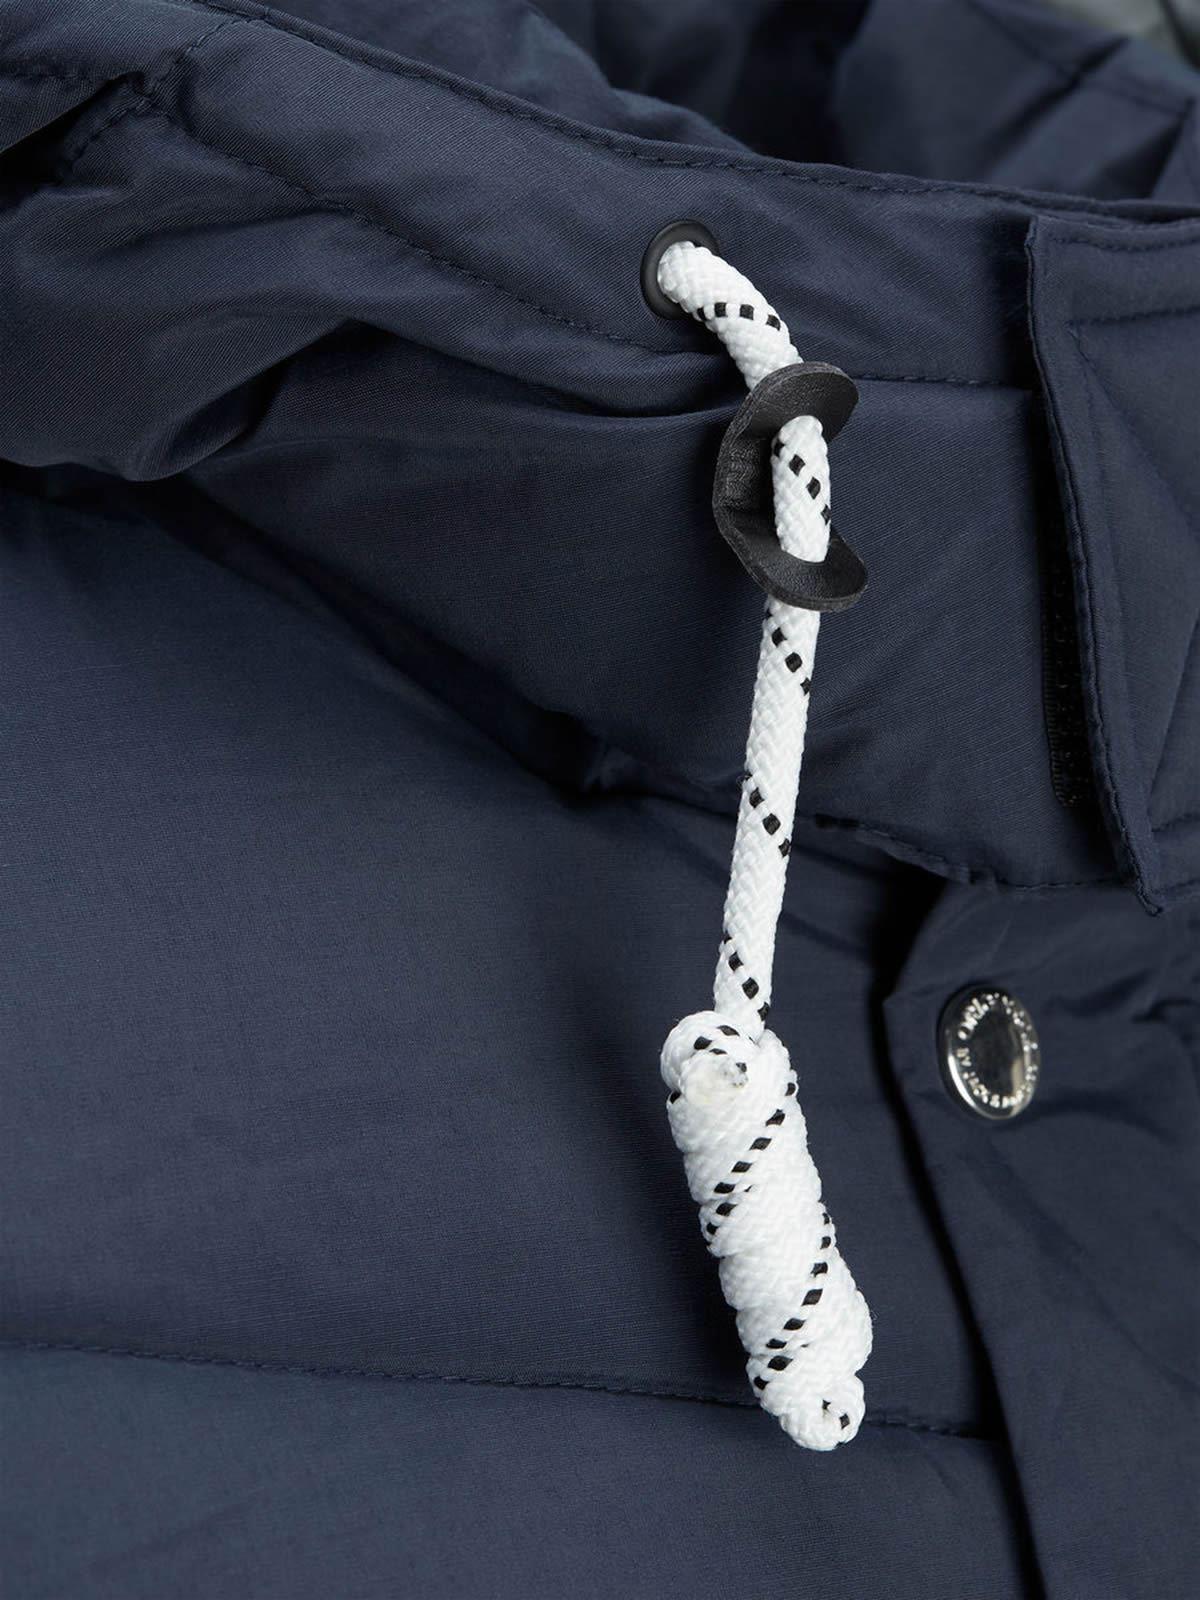 JACK-amp-JONES-Figure-Mens-Jacket-Hooded-Zip-Up-Padded-Bomber-Coat thumbnail 10